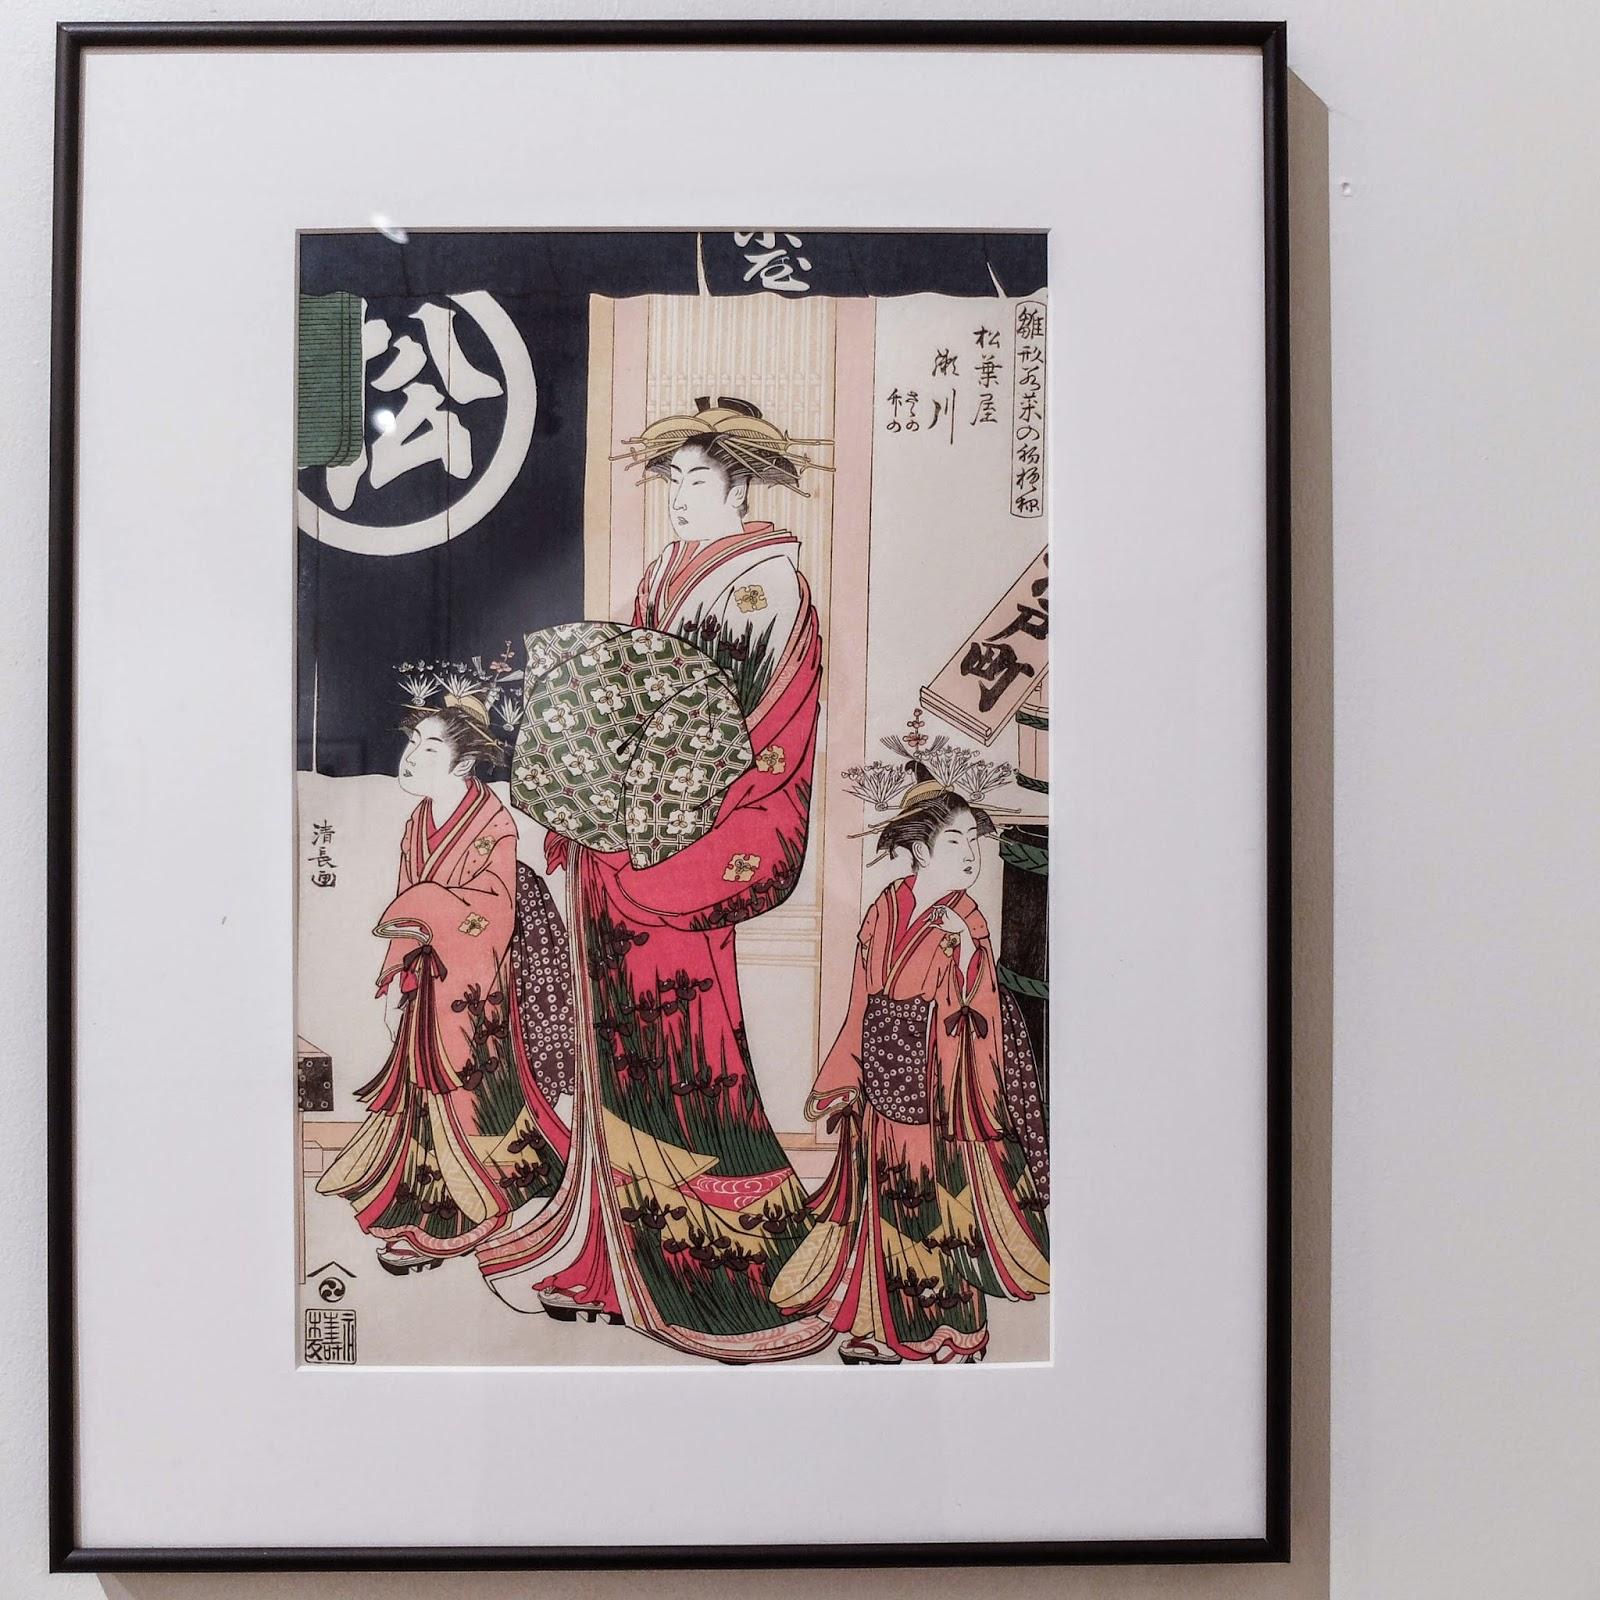 Ukiyoe Portraits exhibit - Segawa of Matsubaya by Kiyonaga Torii